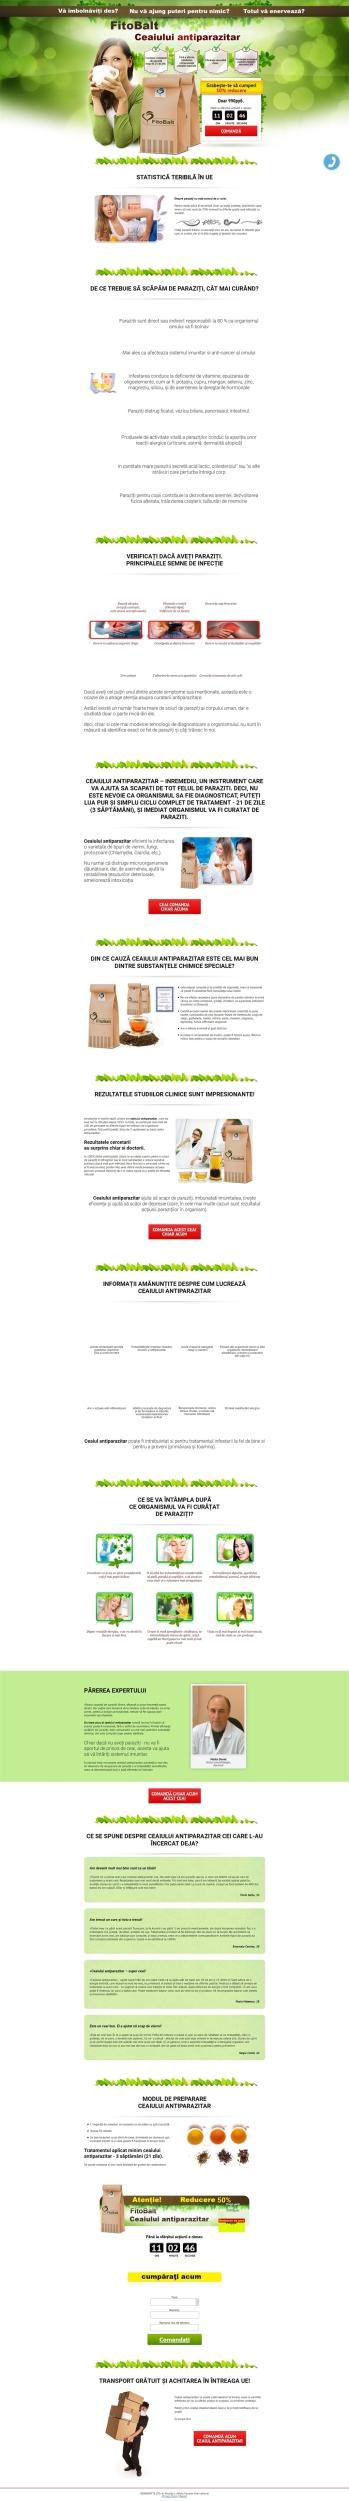 Cum obțineți tsepnem bovin - Remedii parazitare eficiente